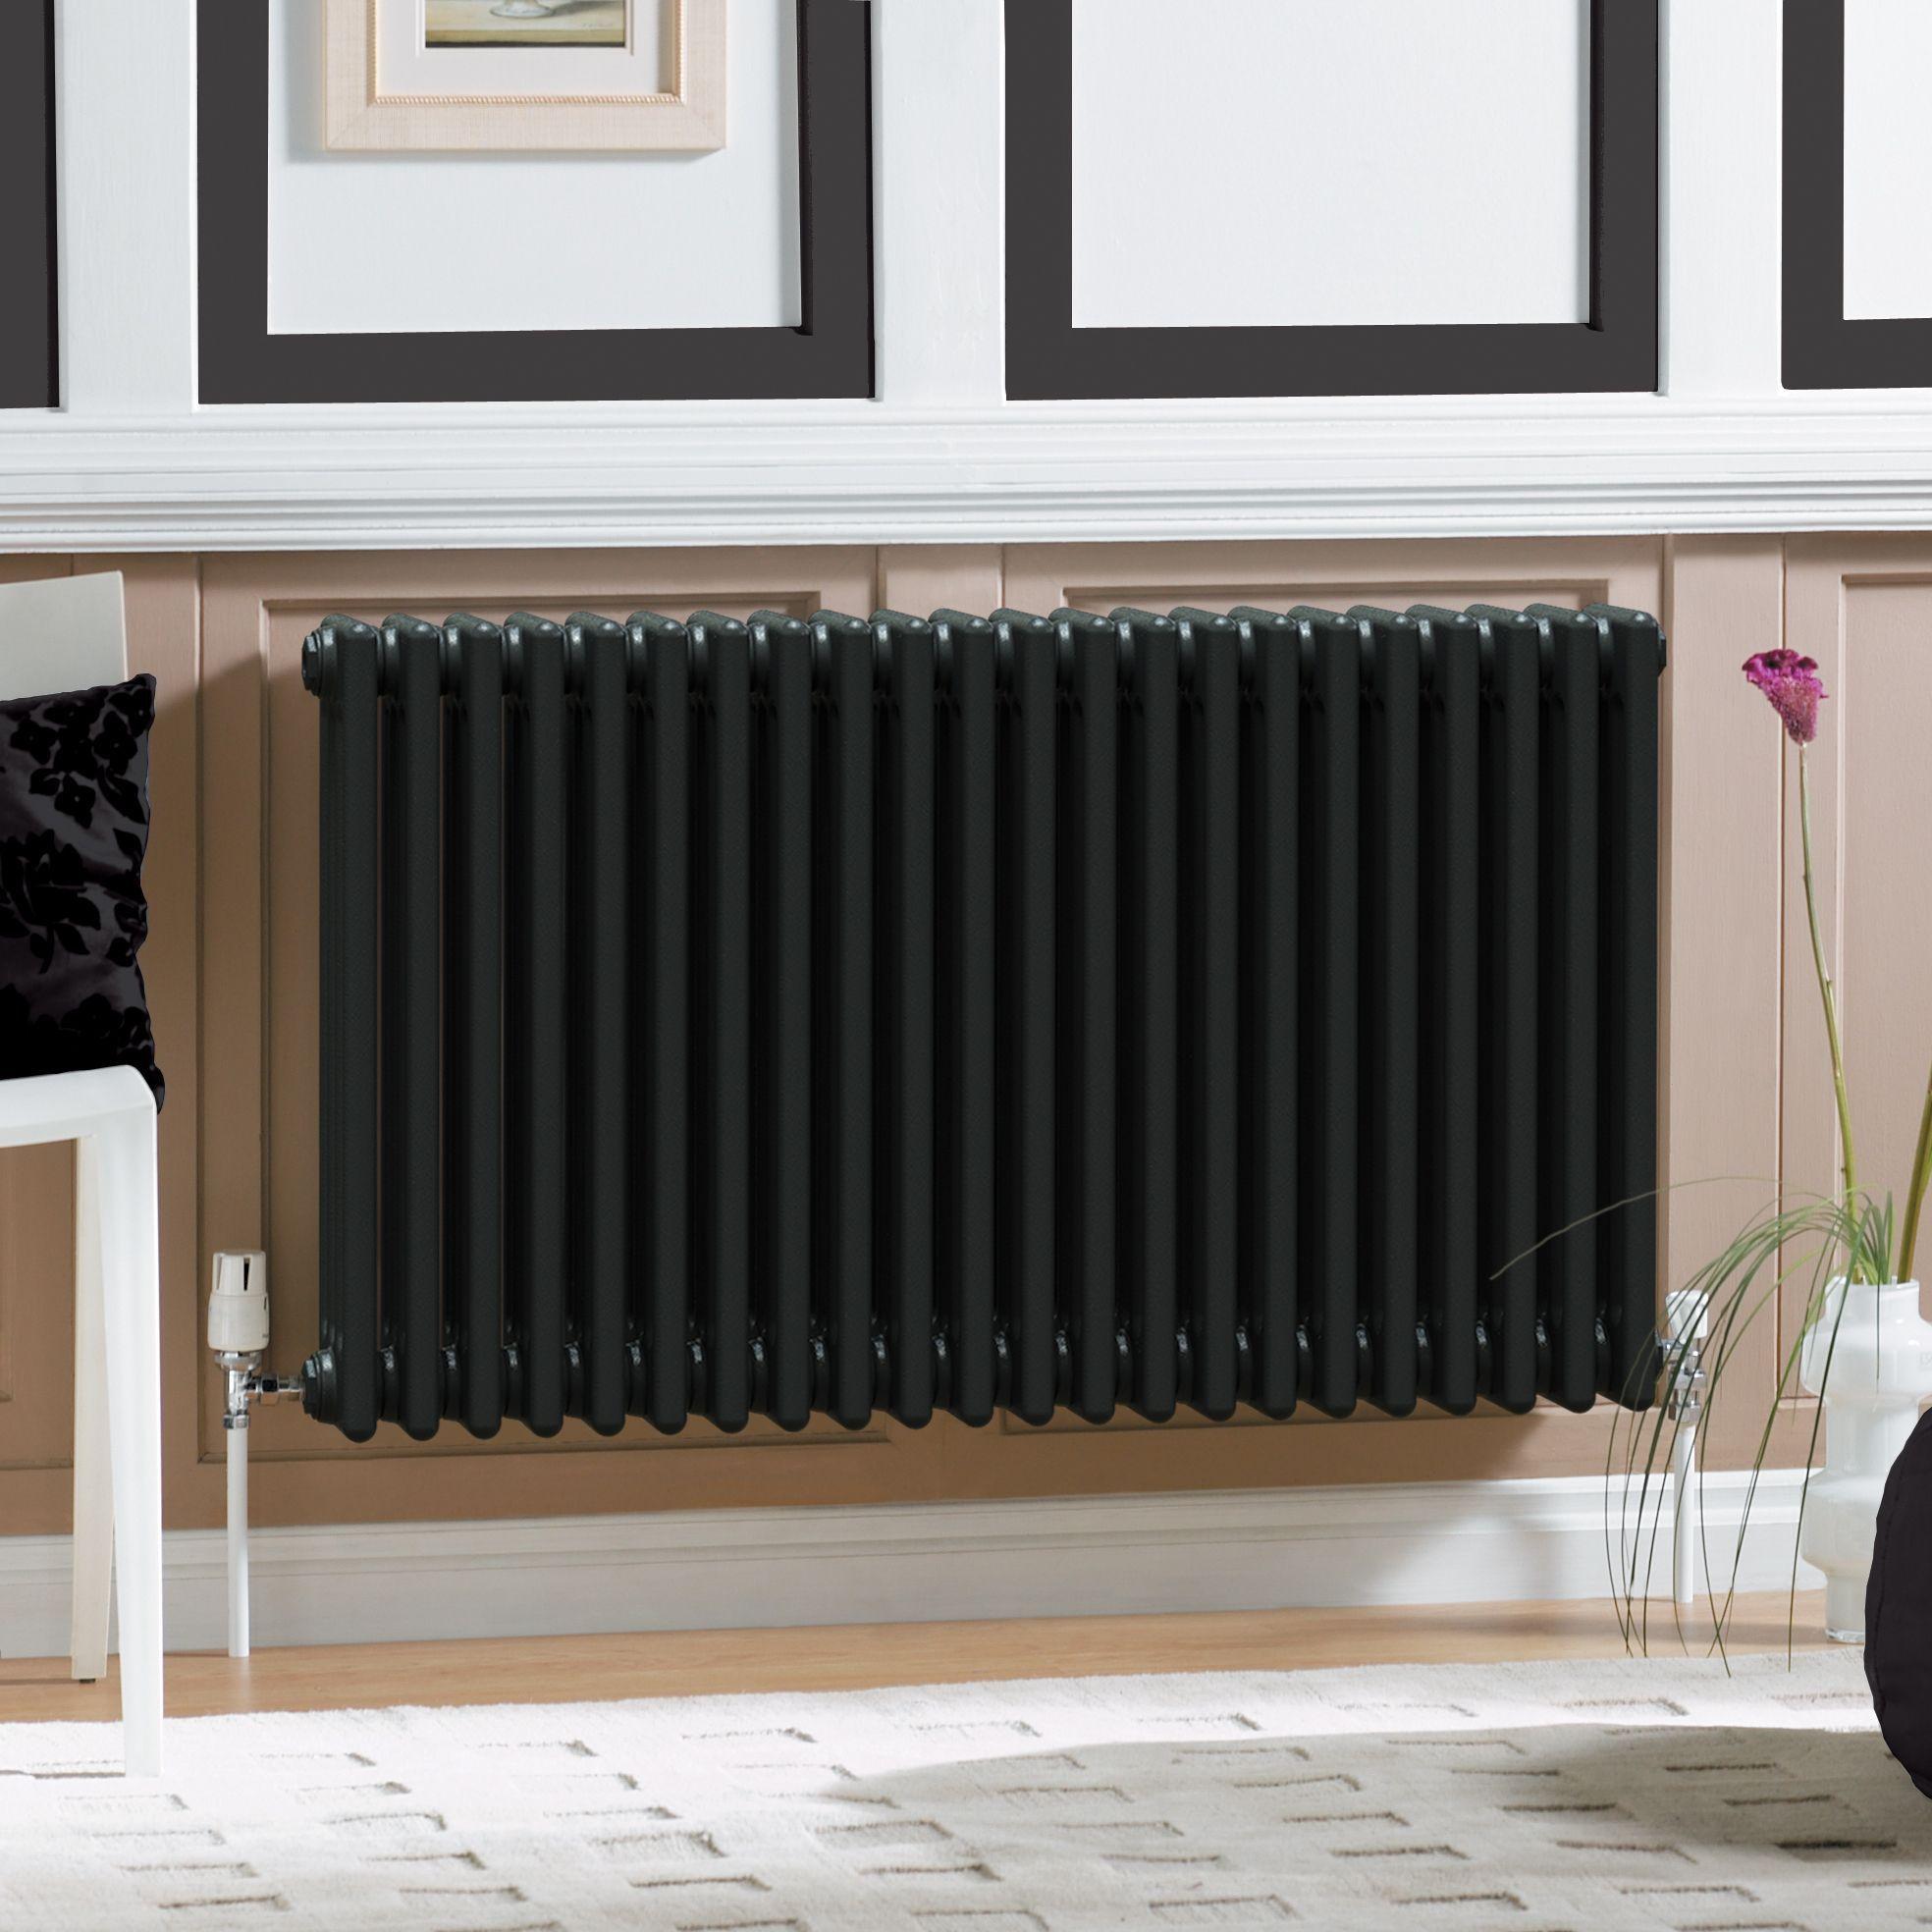 Acova 4 Column radiator, Volcanic (W)812mm (H)600mm